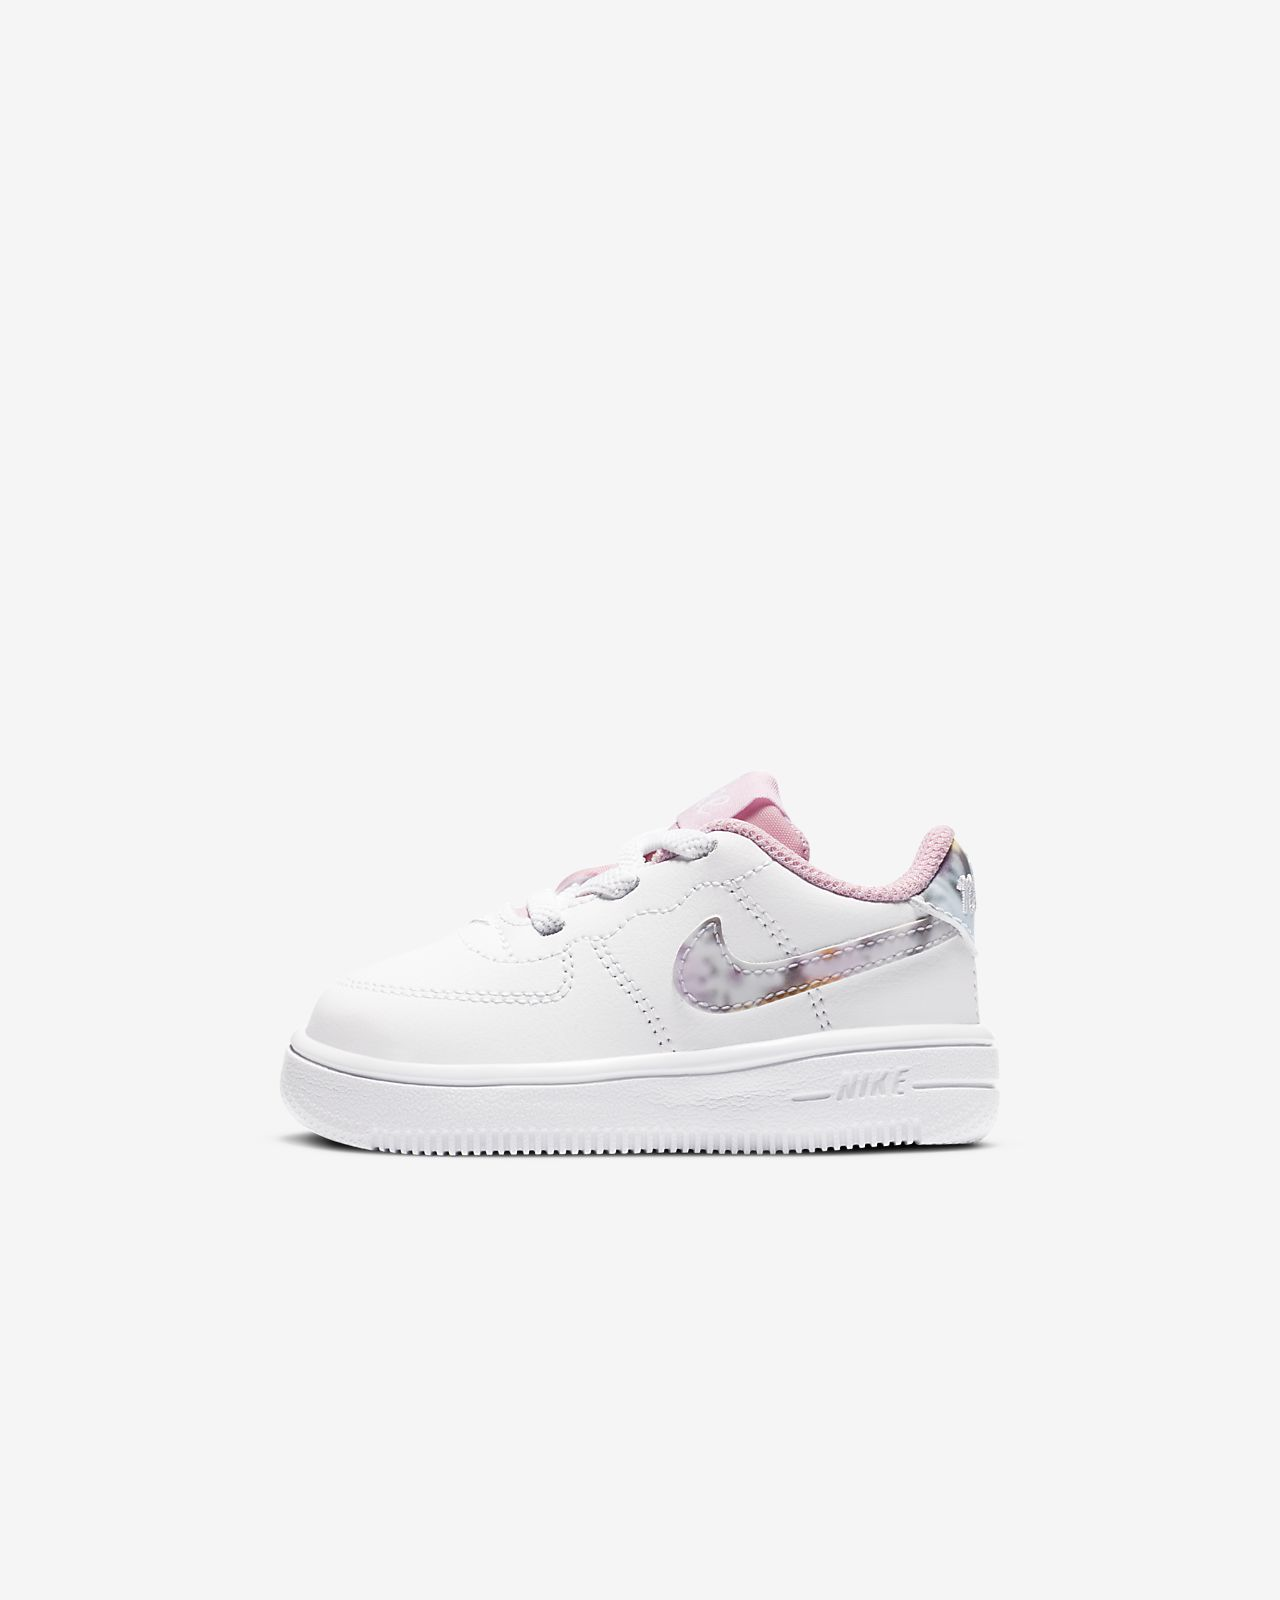 Nike Force 1 '18 SE 嬰幼兒鞋款